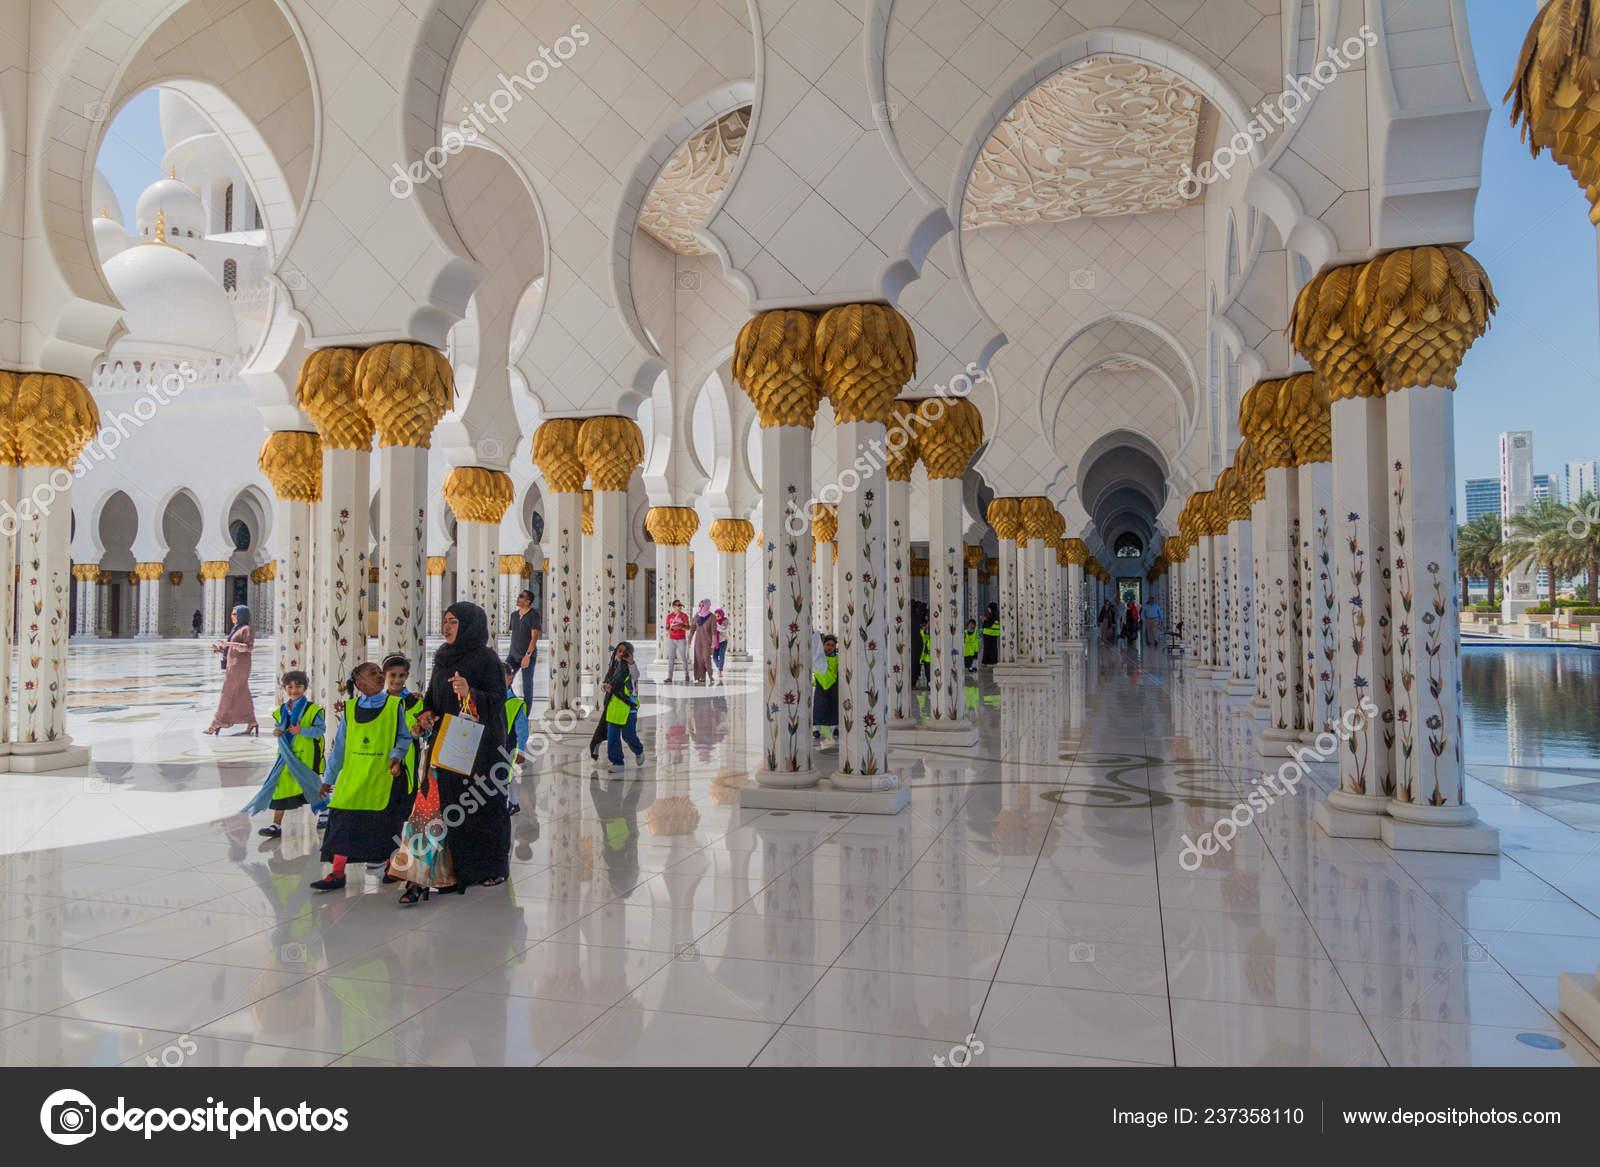 Abu Dhabi Uae March 2017 Group Children Visiting Sheikh Zayed